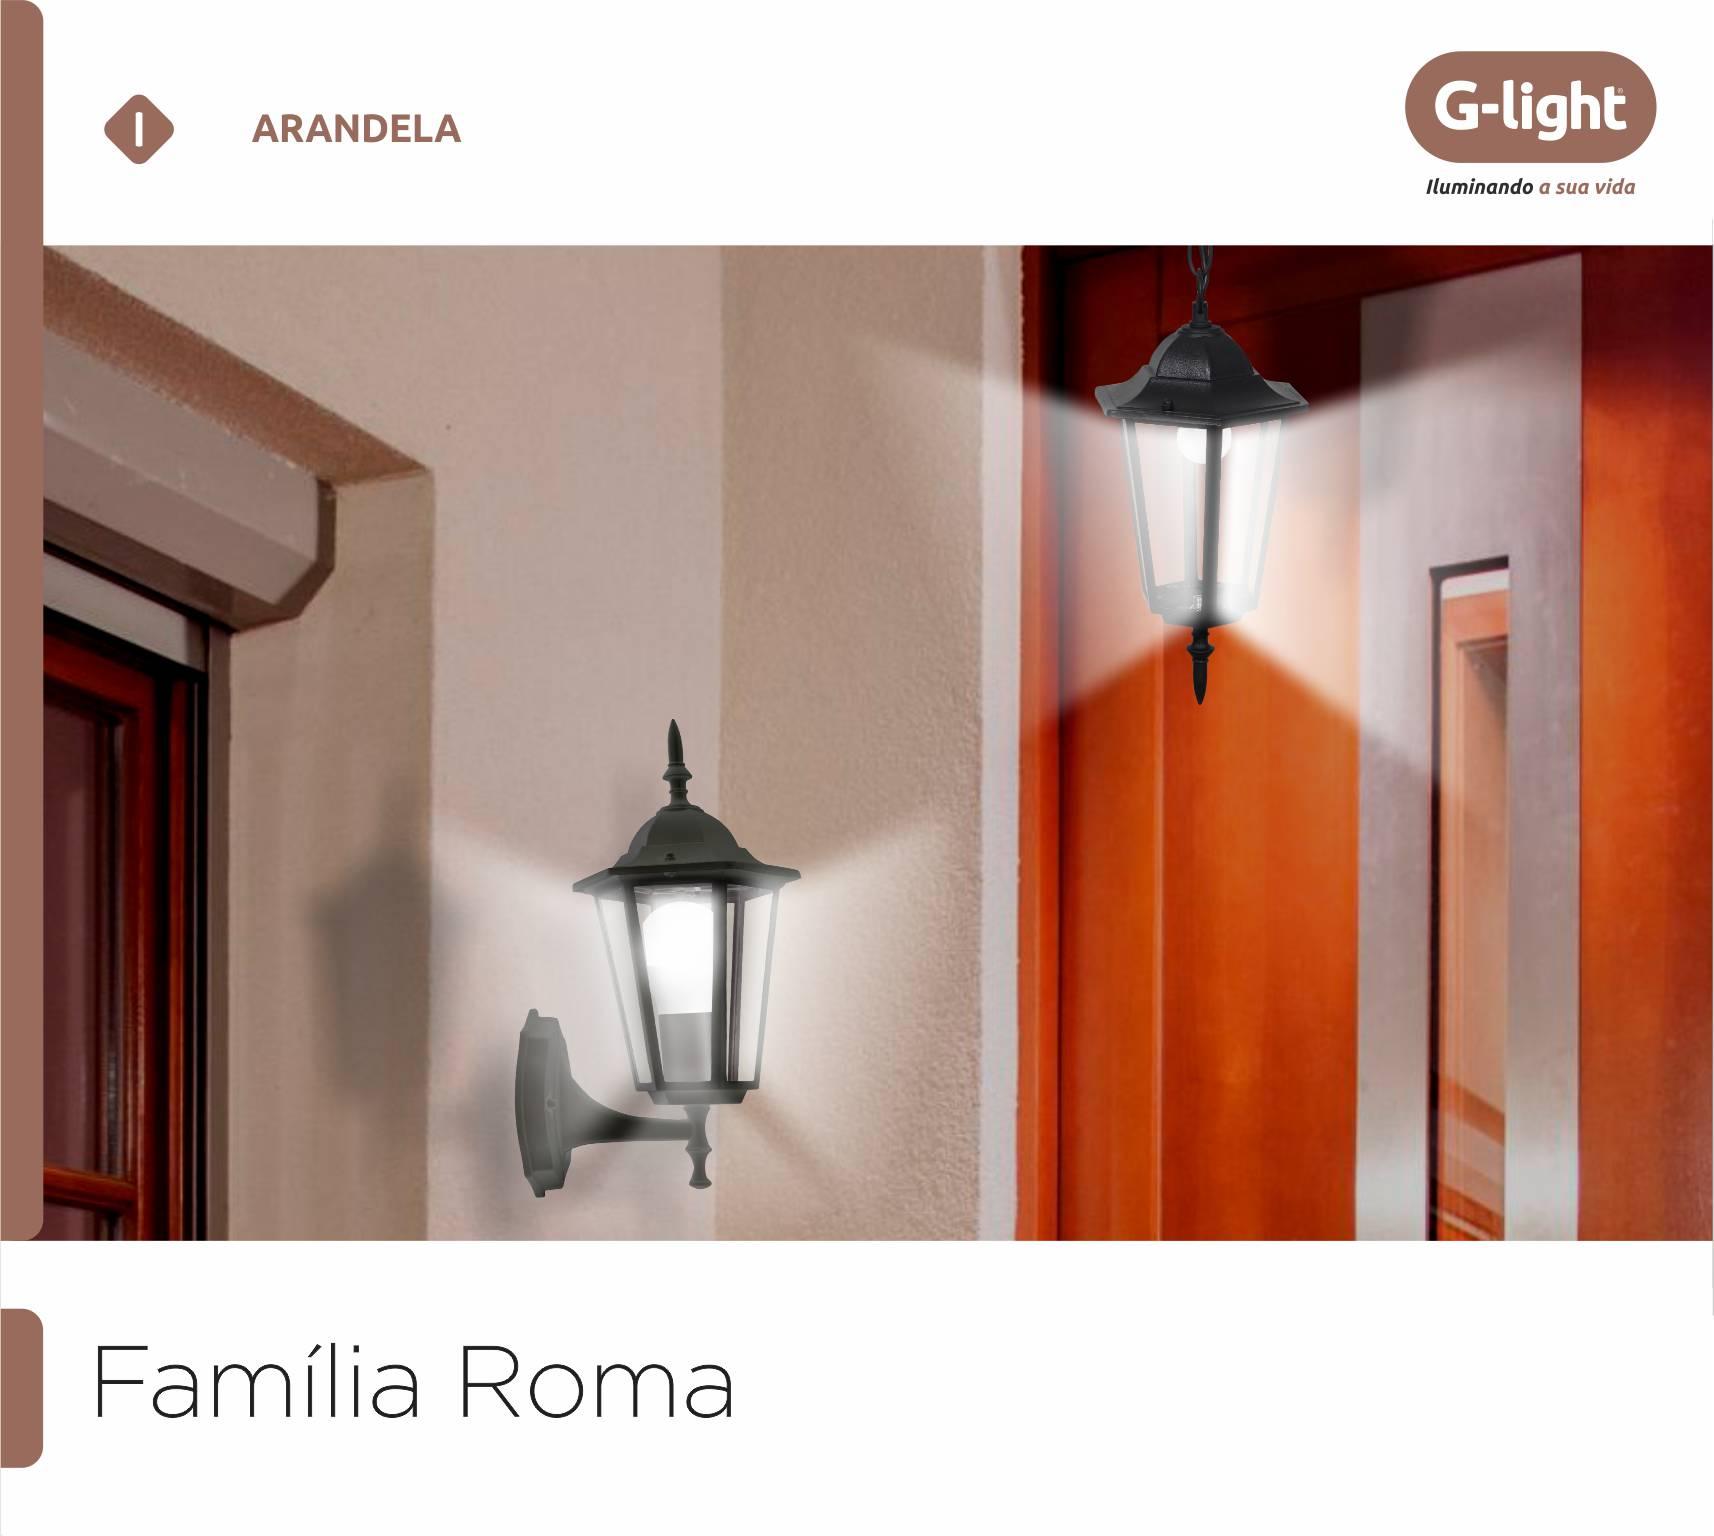 Família Roma